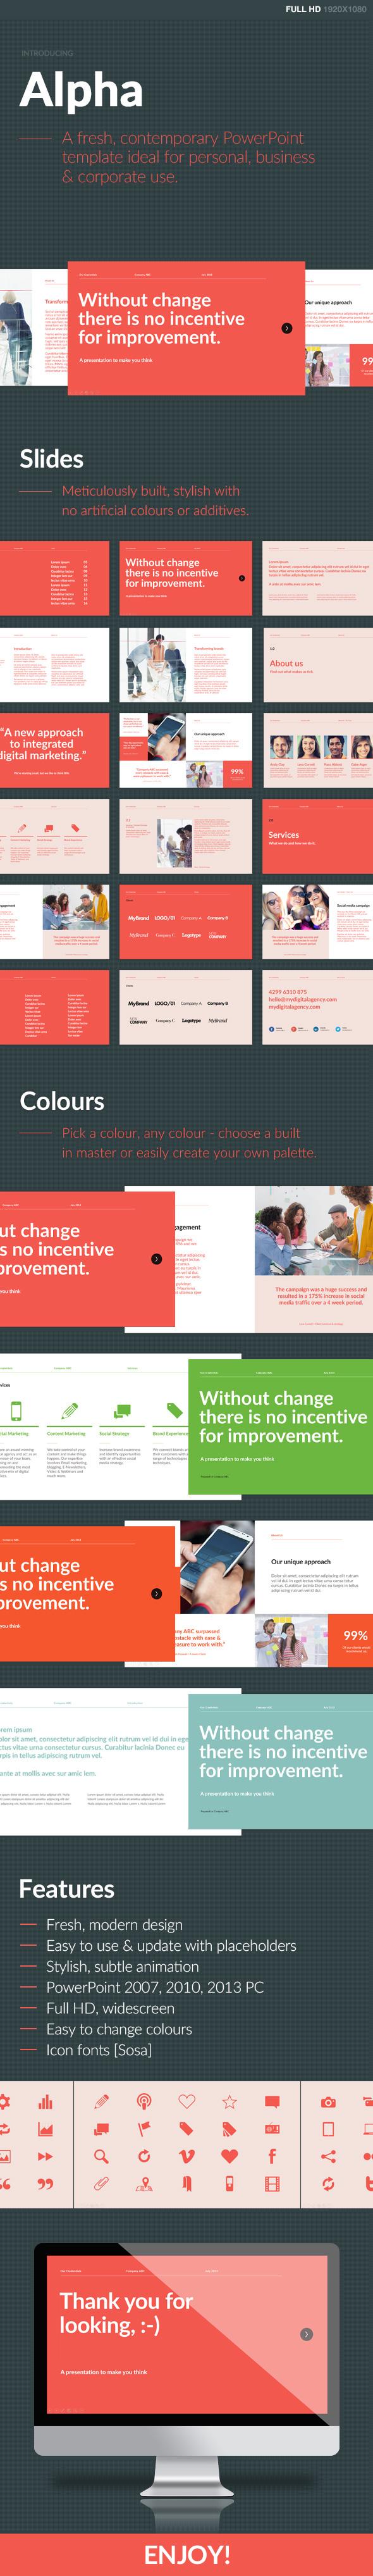 Alpha powerpoint template on behance toneelgroepblik Choice Image